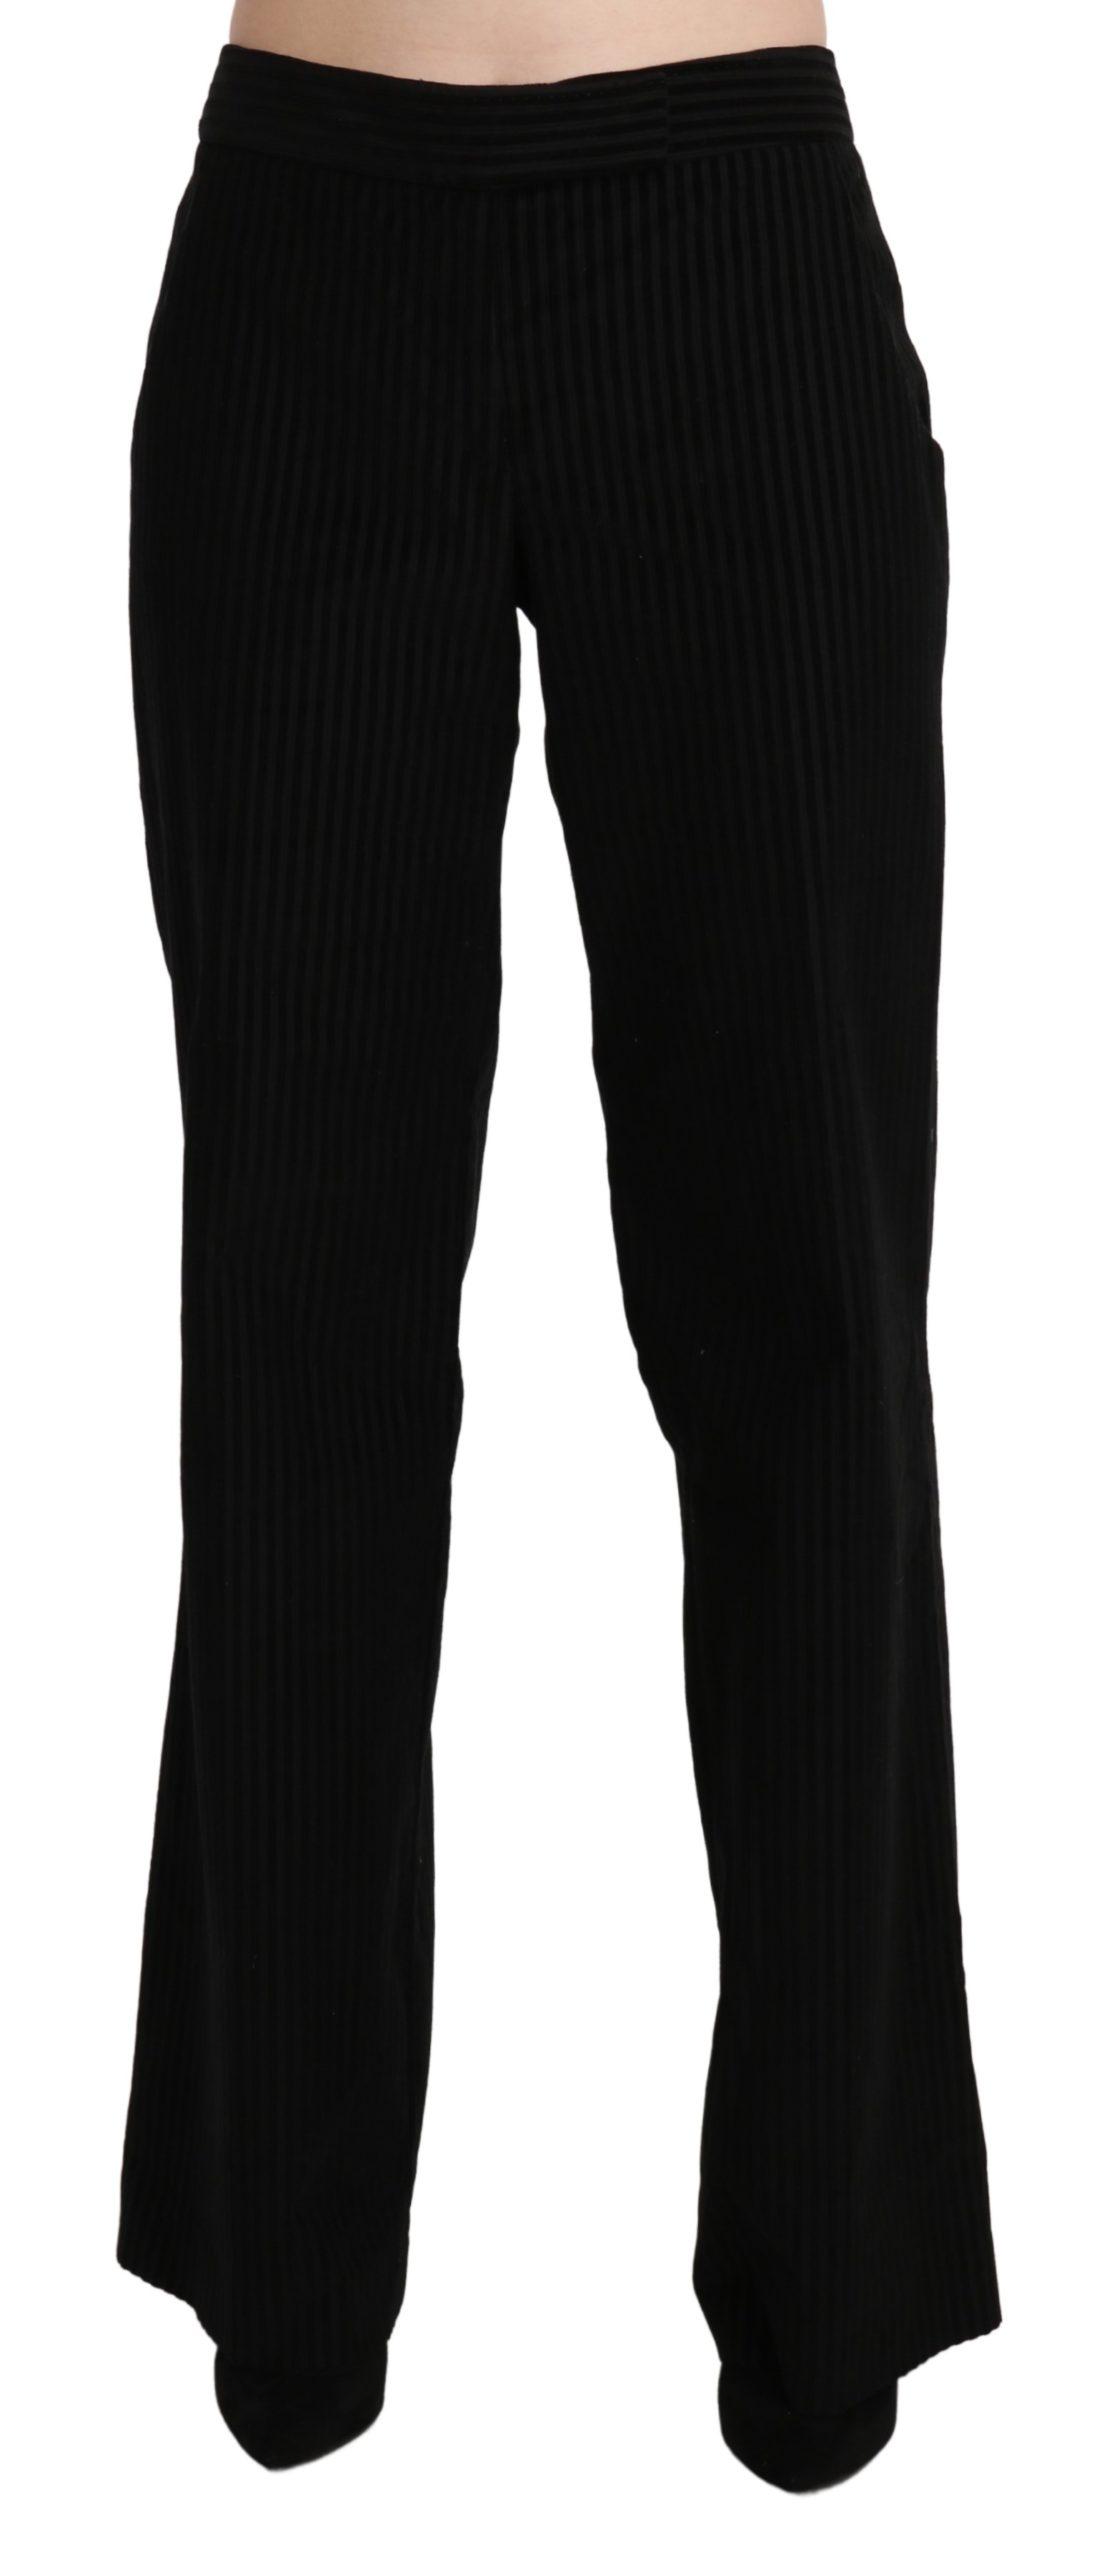 Cotton Black High Waist Flared Pants - IT44 L